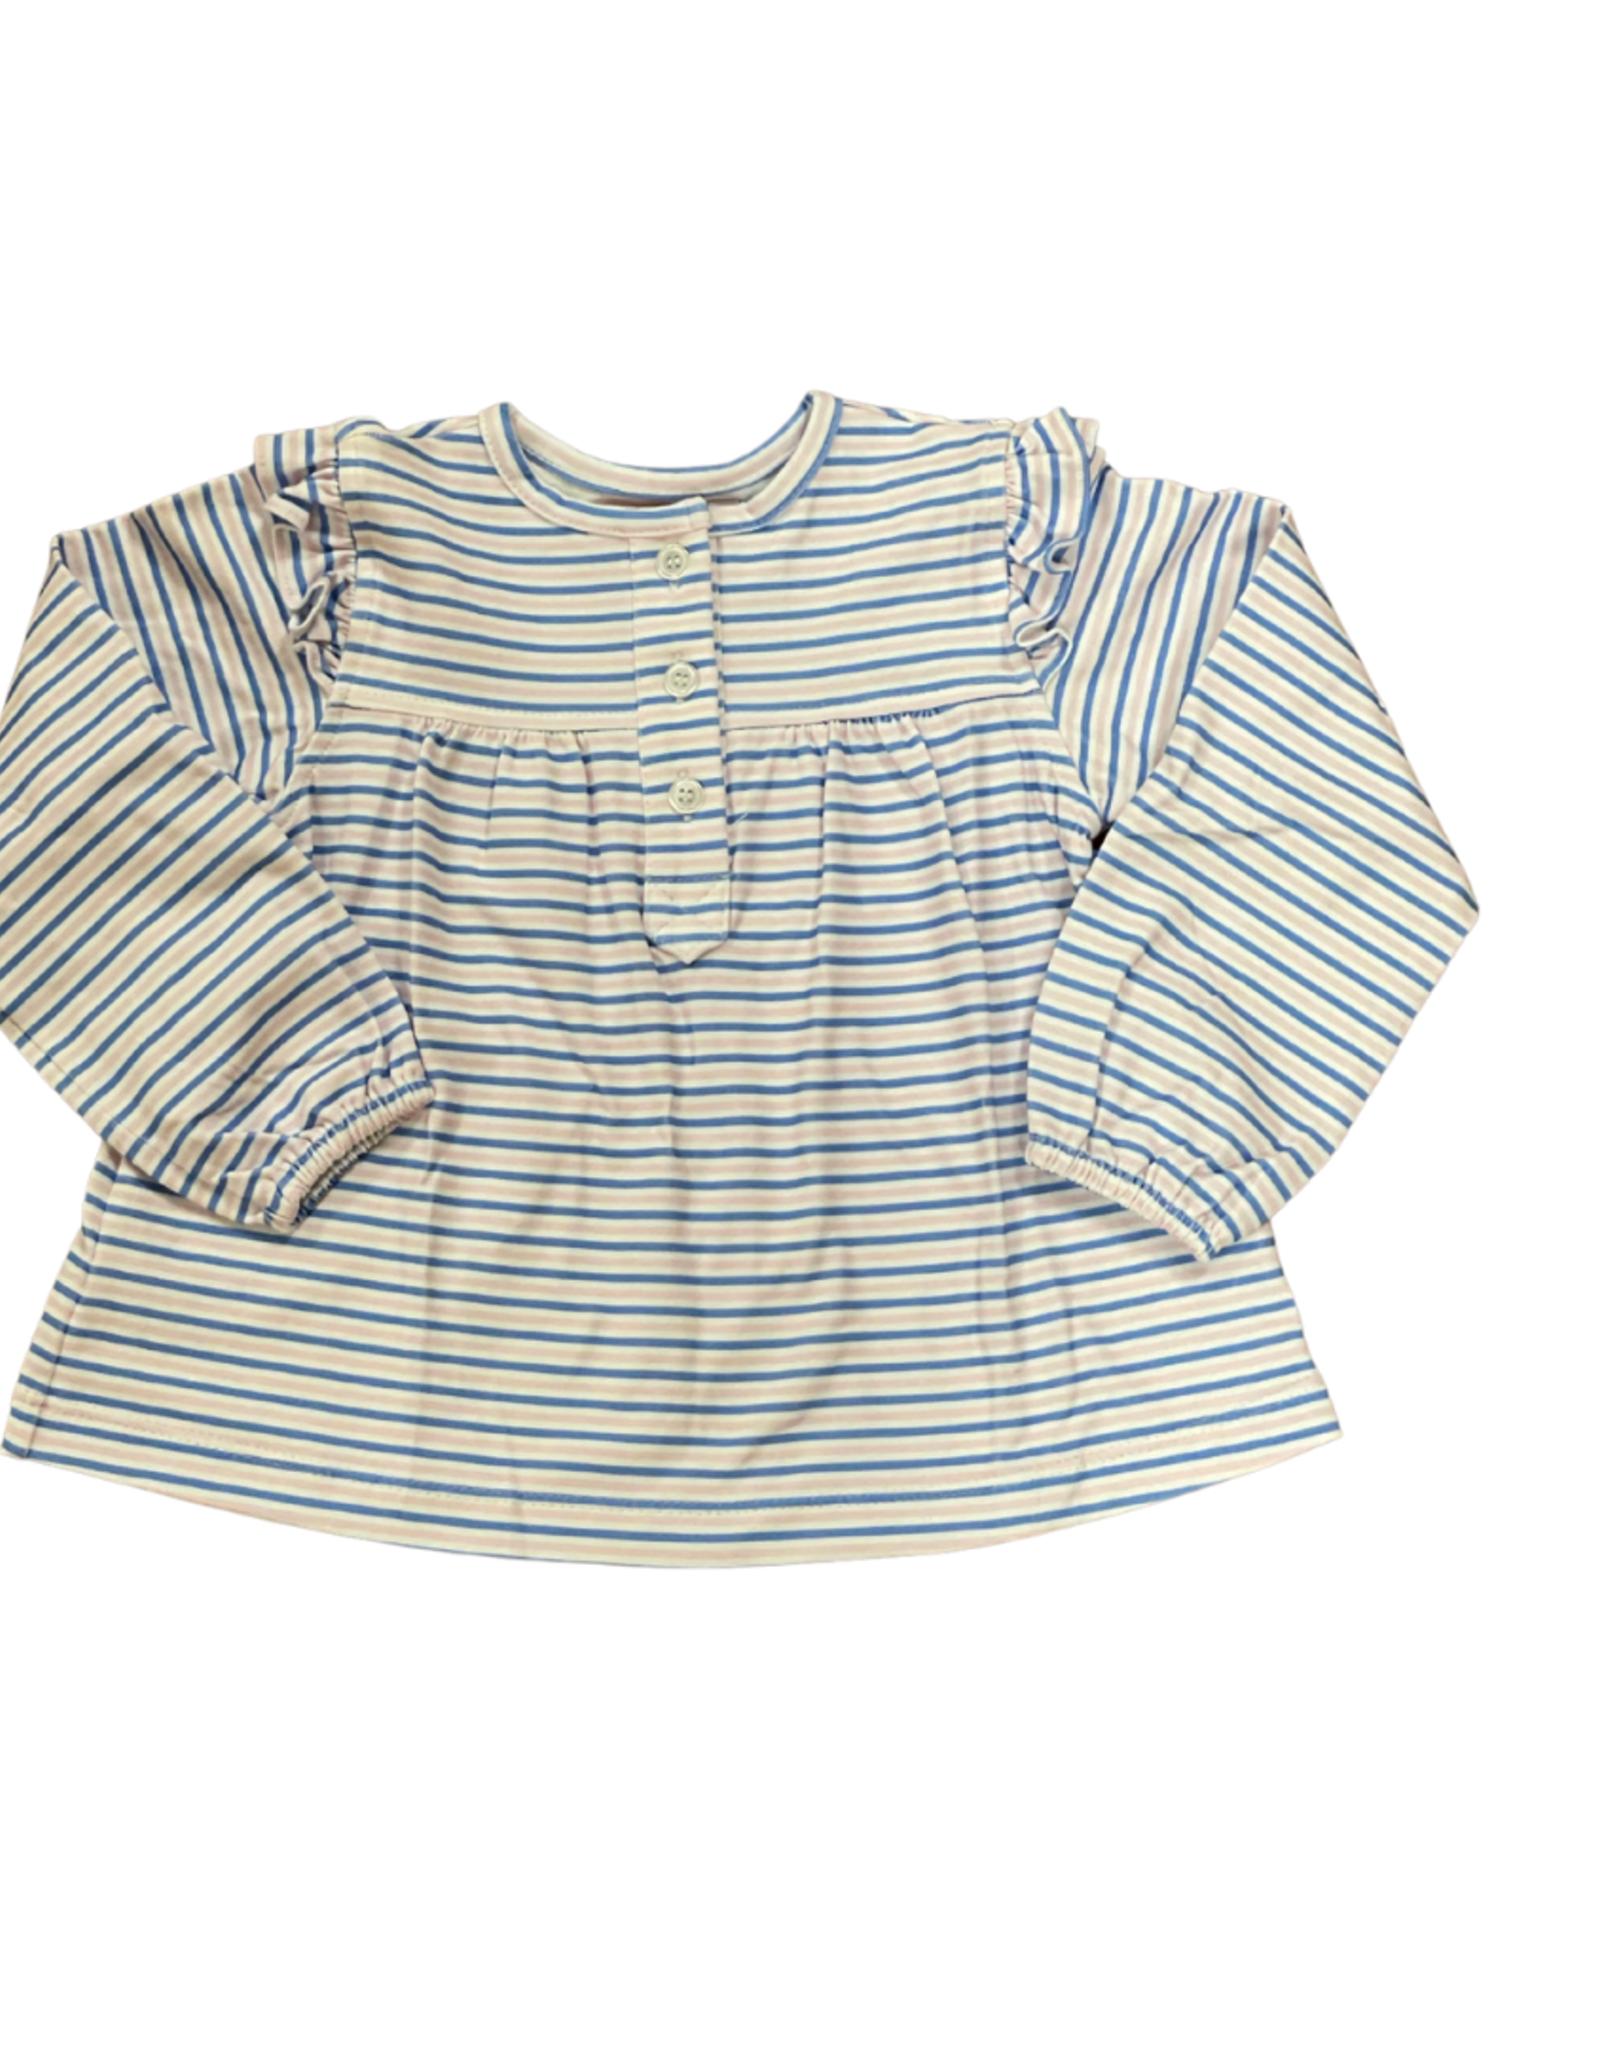 Peggy Green Long Sleeve Pima Ruffle Top Baby Pink/Royal Stripe